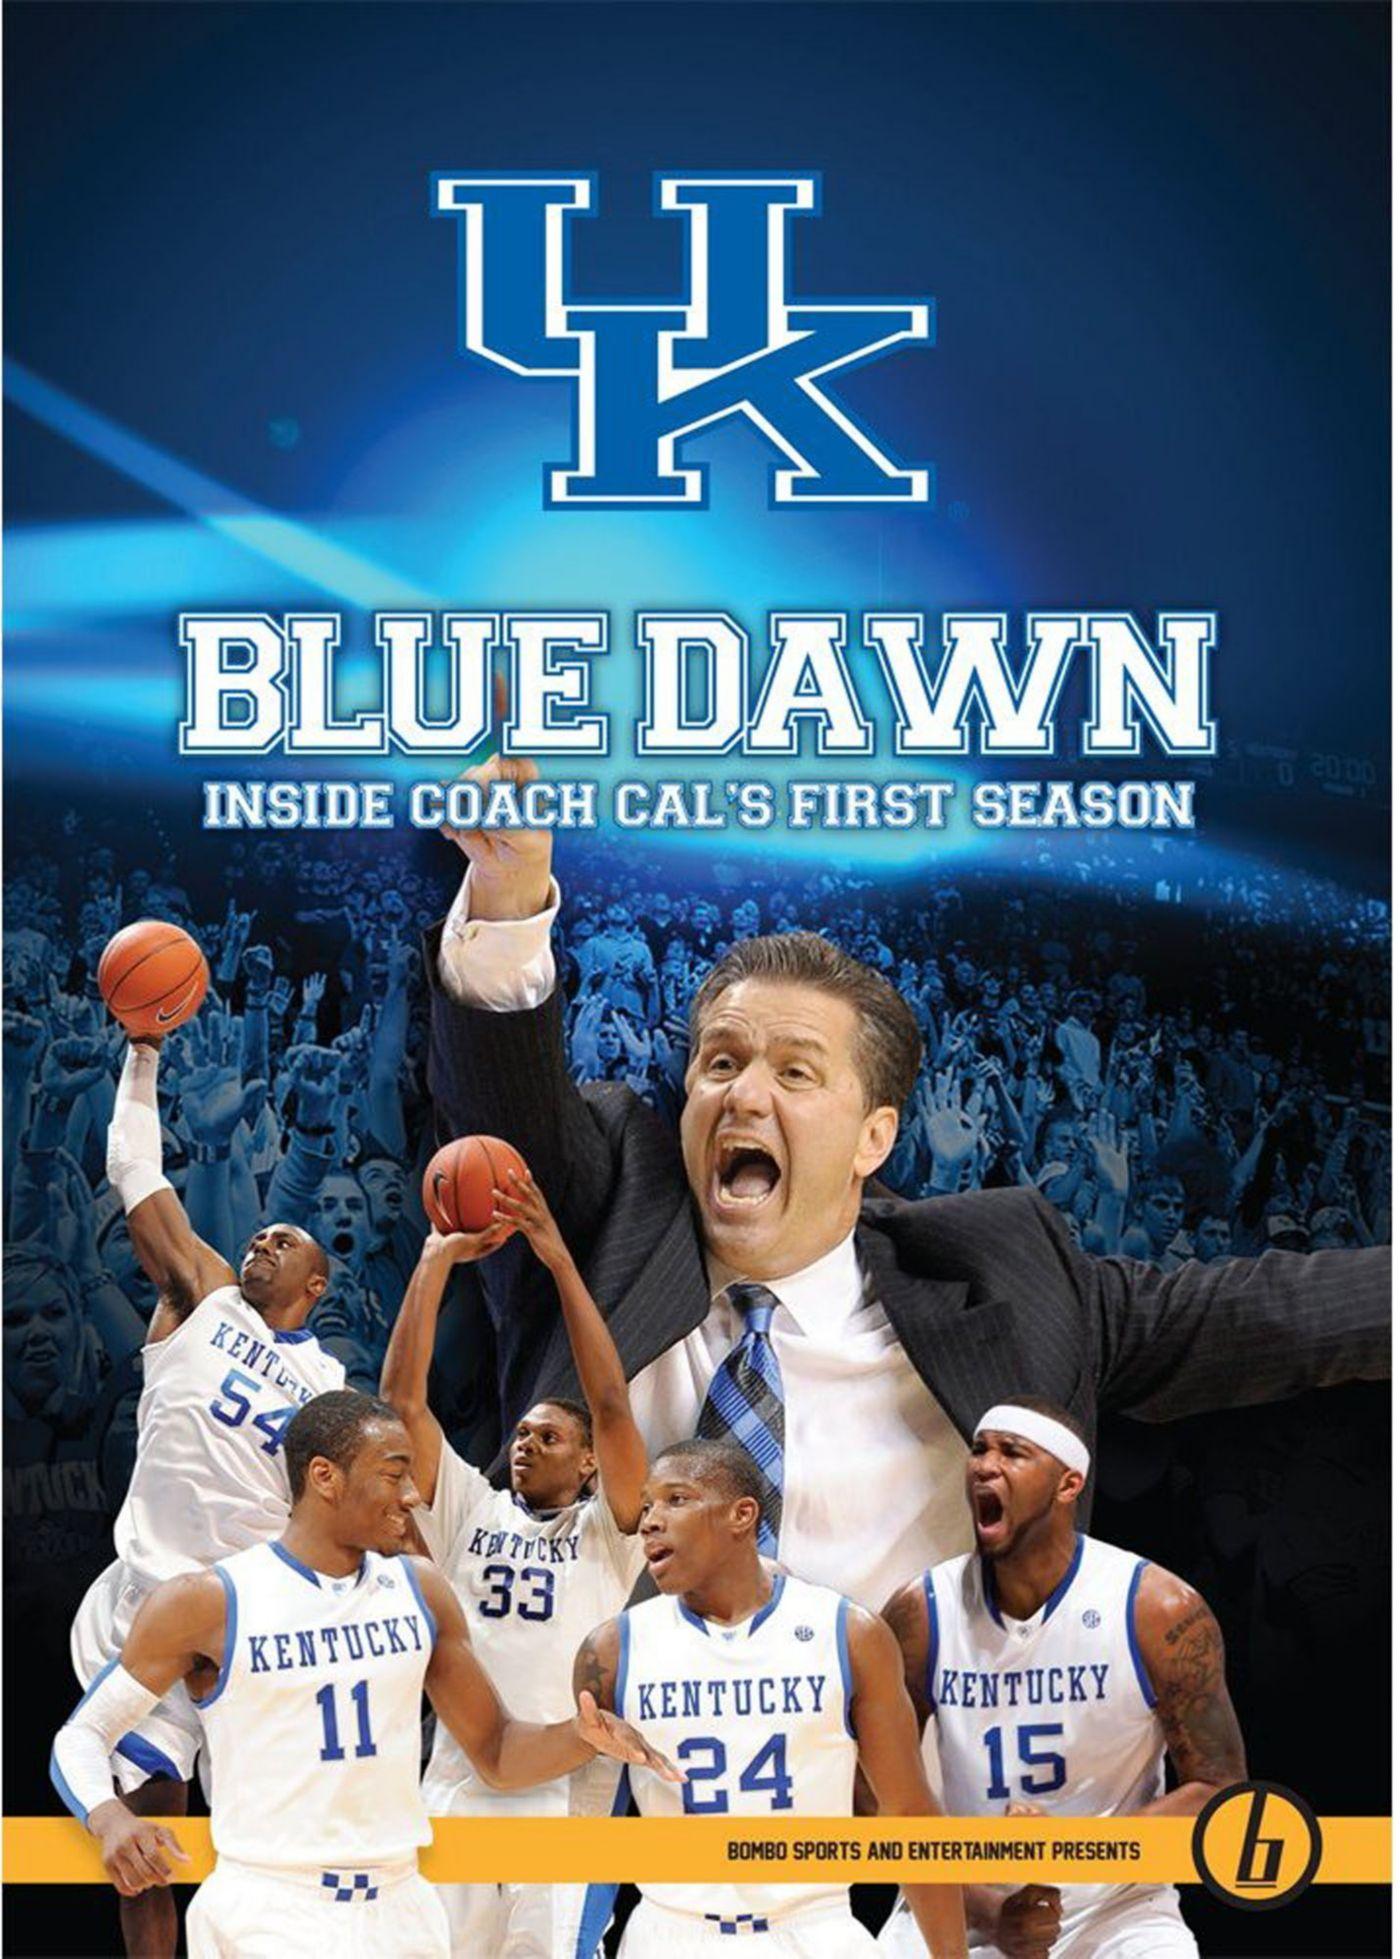 UK Blue Dawn: Inside Coach Cal's First Season DVD